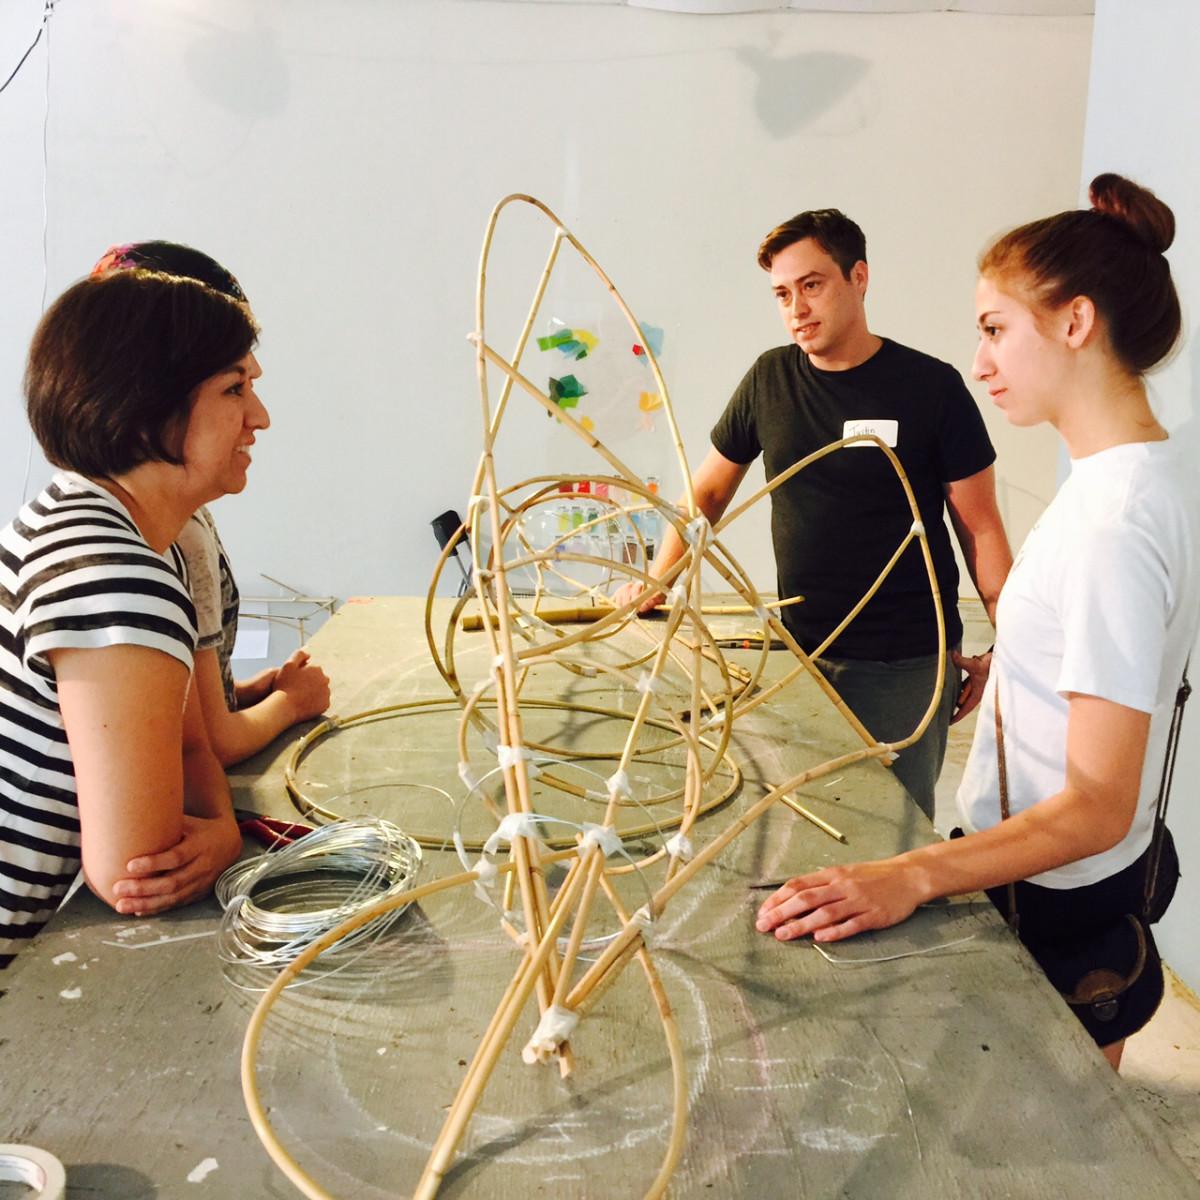 News, Shelby, Buffalo Bayou Park lanterns, August 2015, Justin Dunford